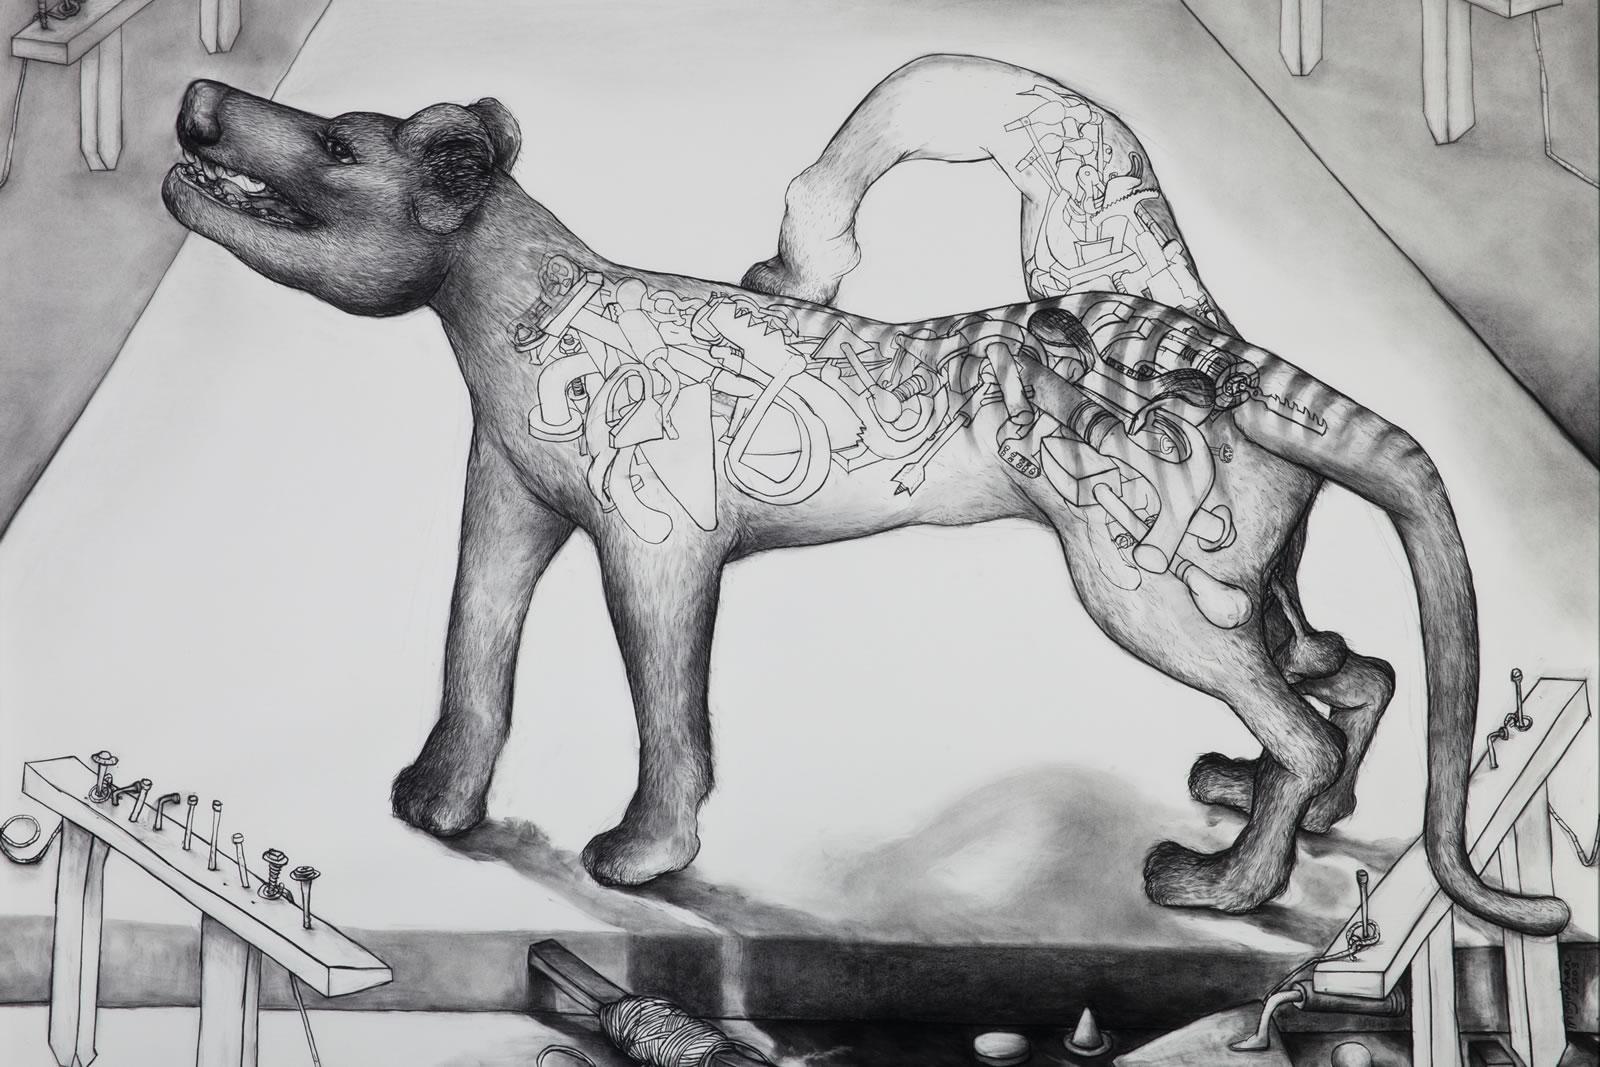 2003 Winner of The Hutchins Art Prize - Daniel Moynihan - Celtic Tool Tiger